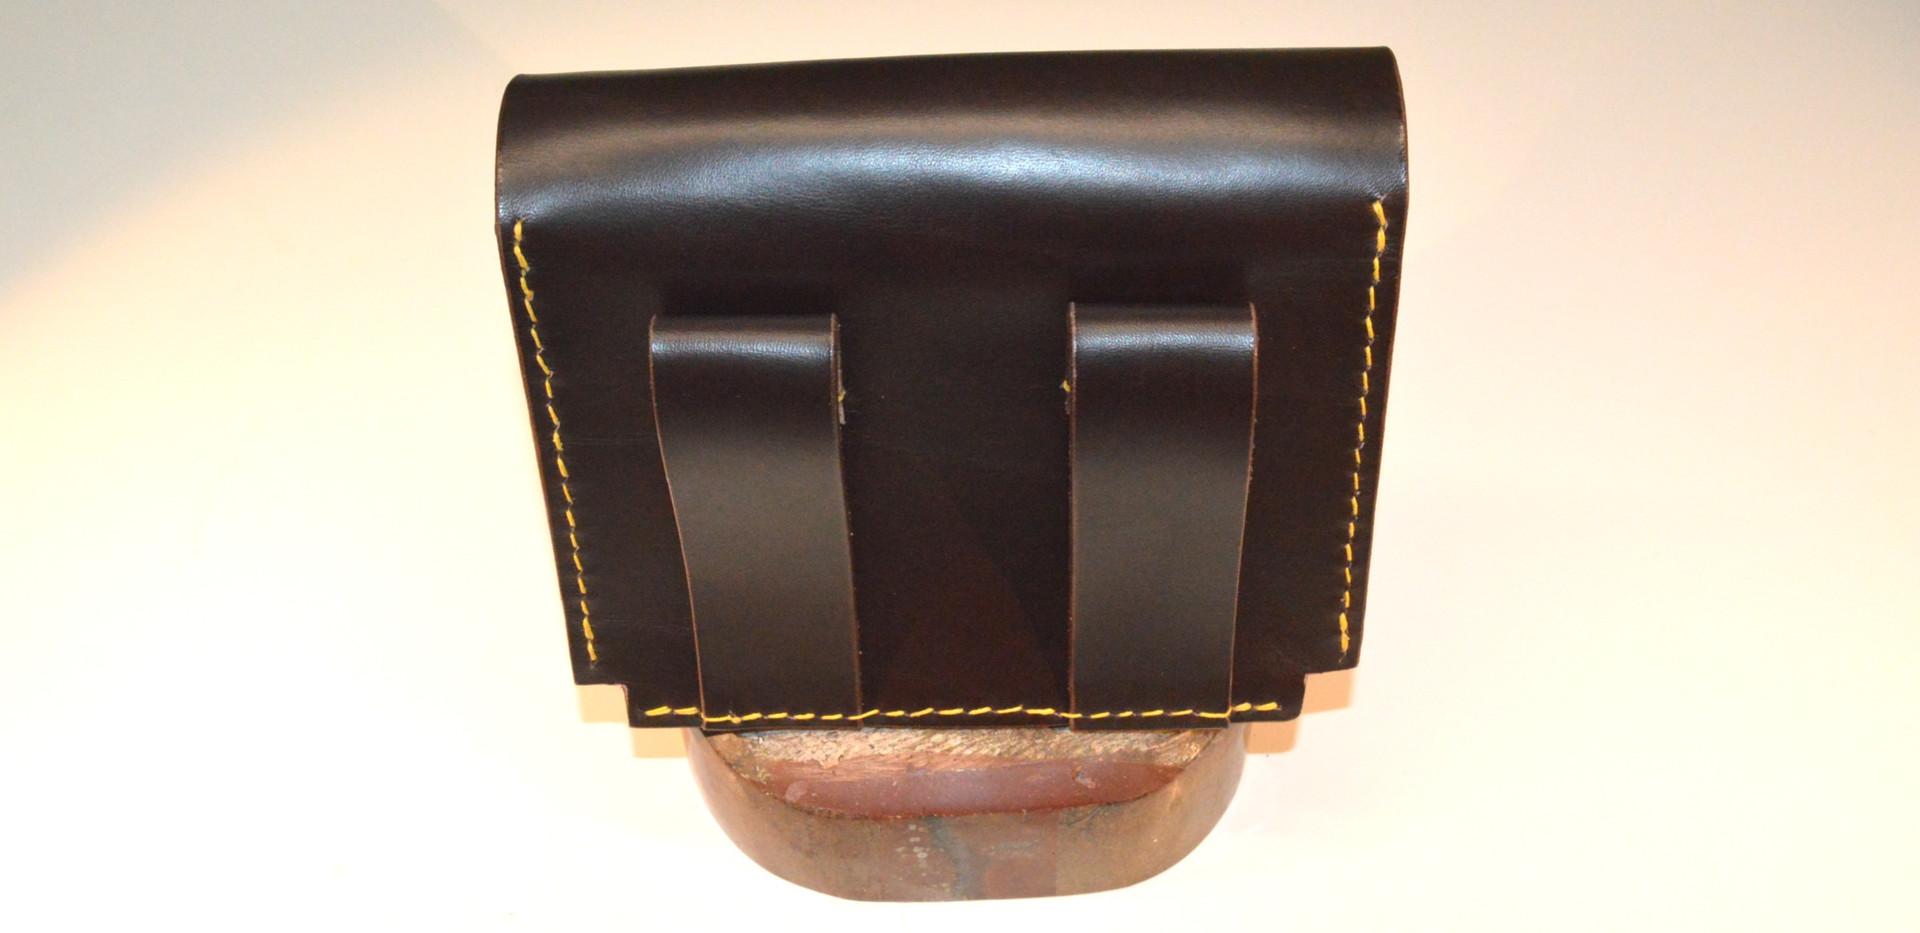 Pochette ceinture en cuir brun